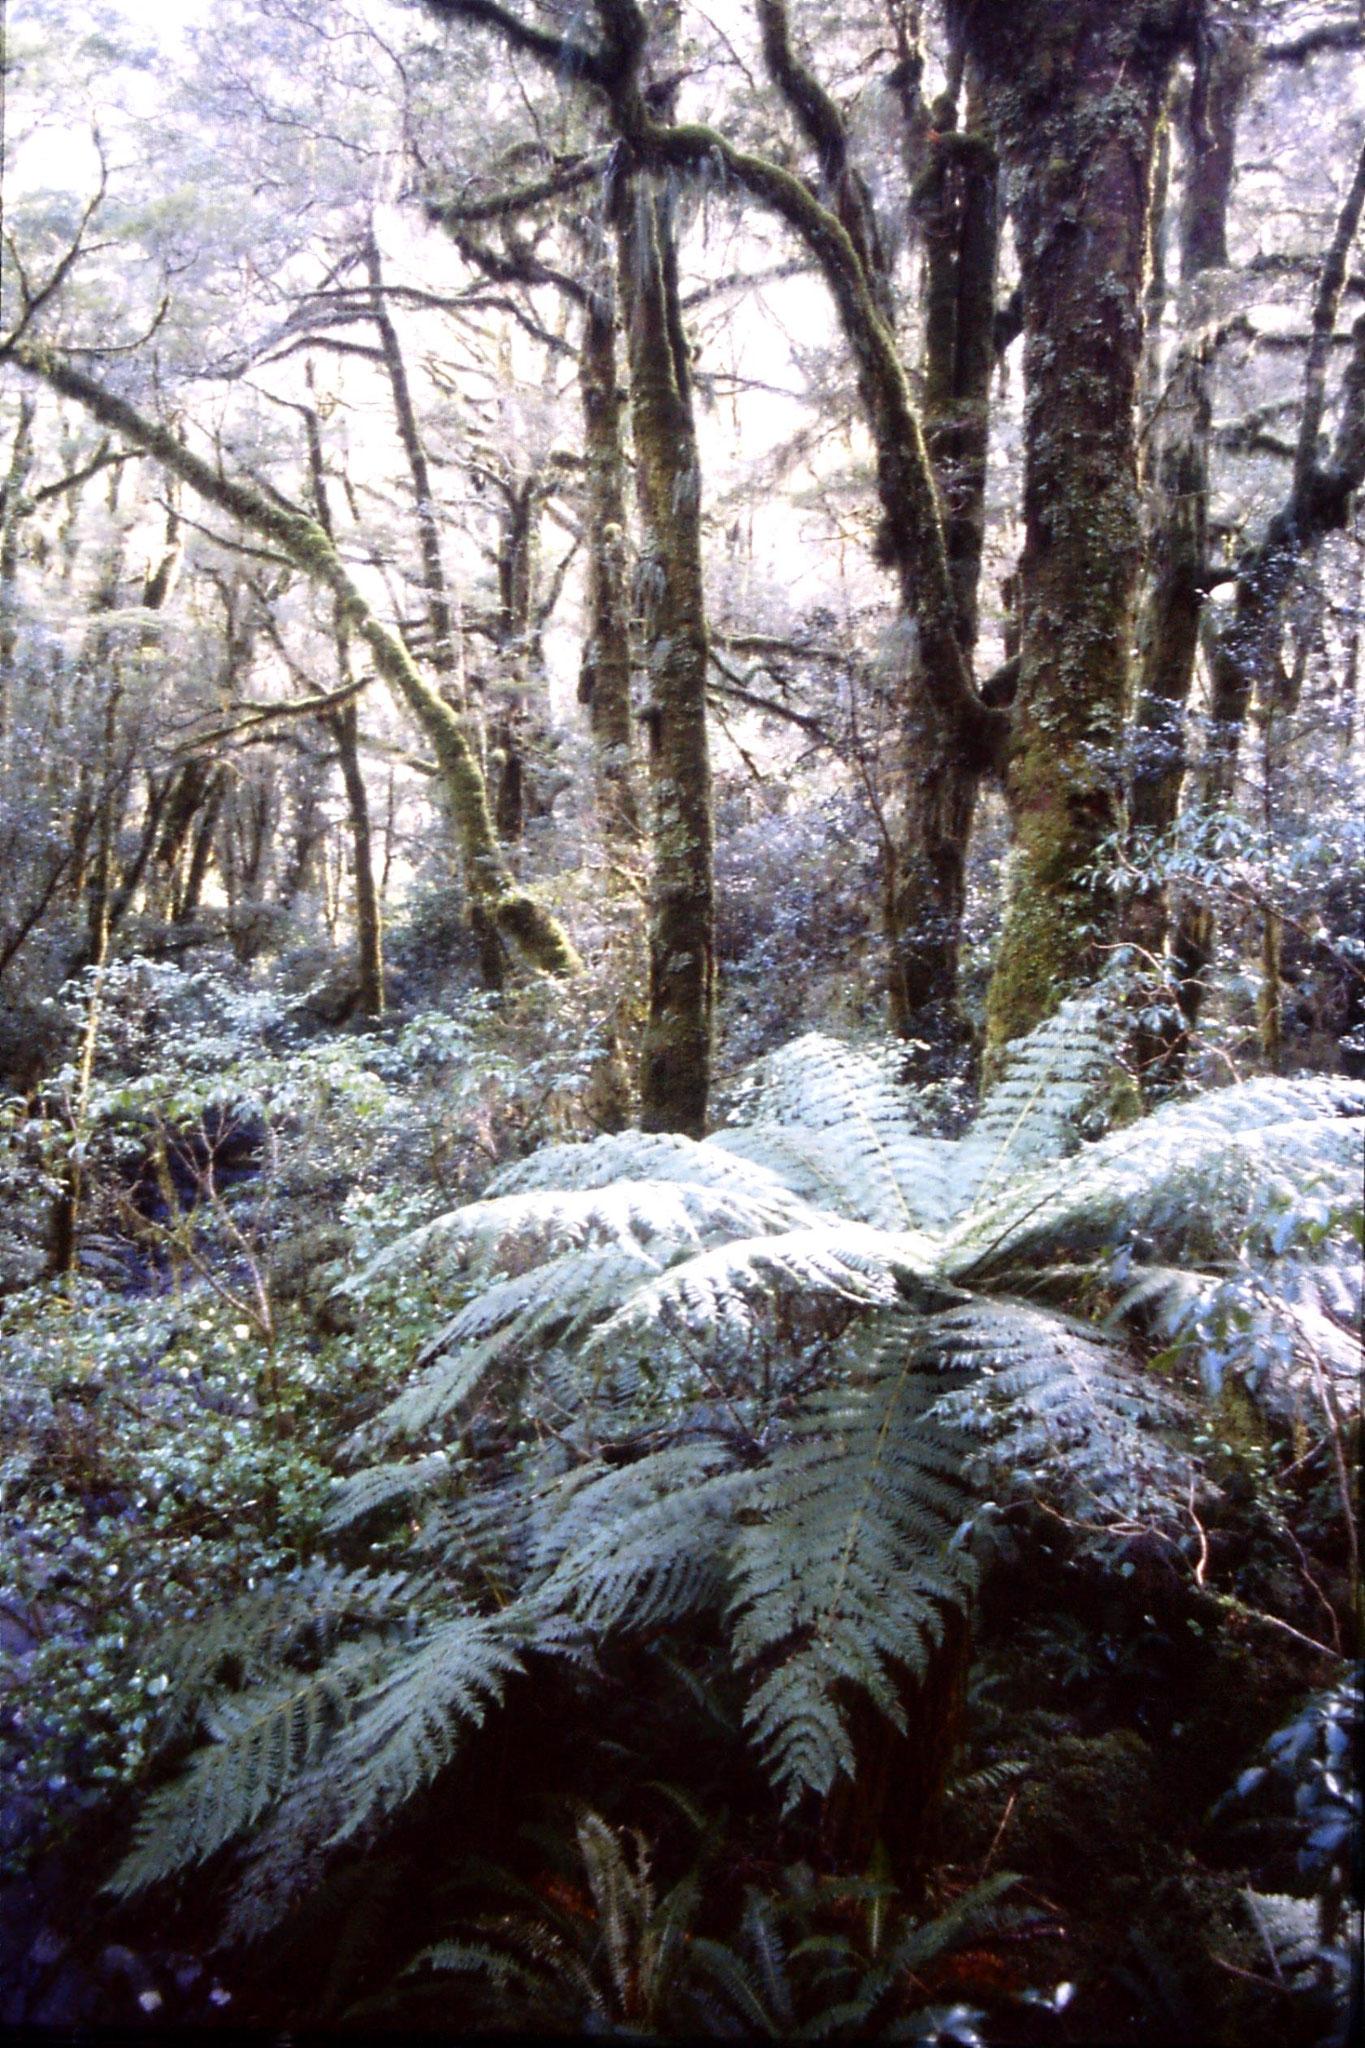 15/8/1990: 5: tree ferns